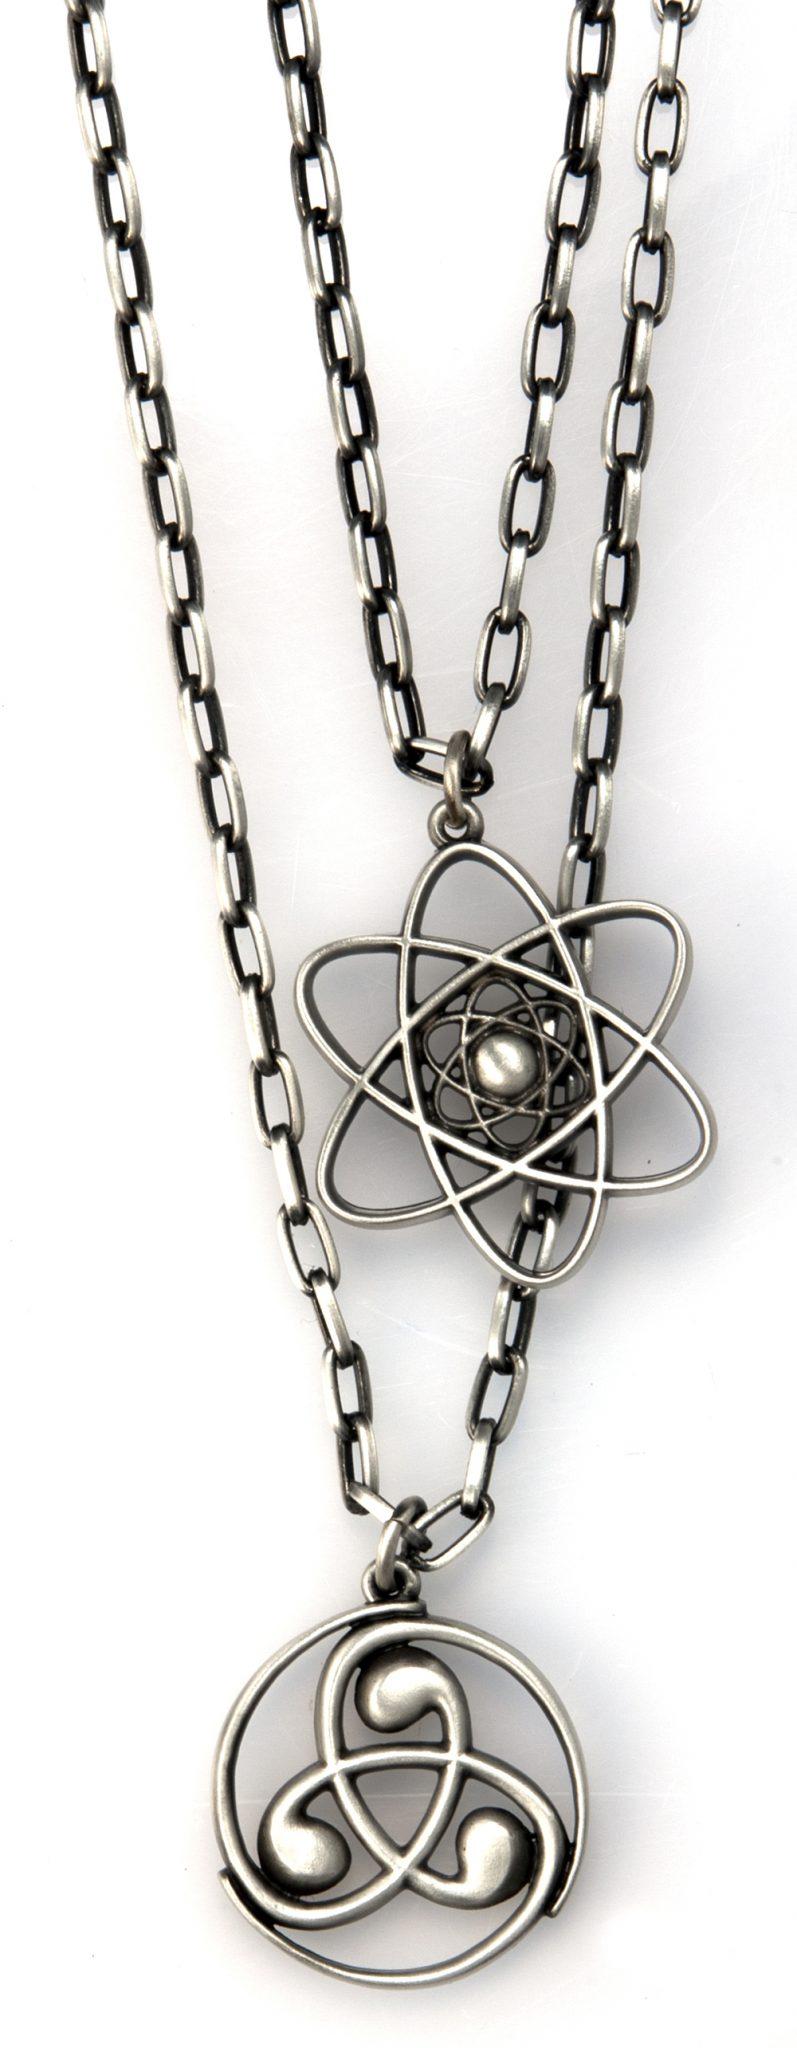 Atomica Corrected - Bico Australia - mens chain pendants